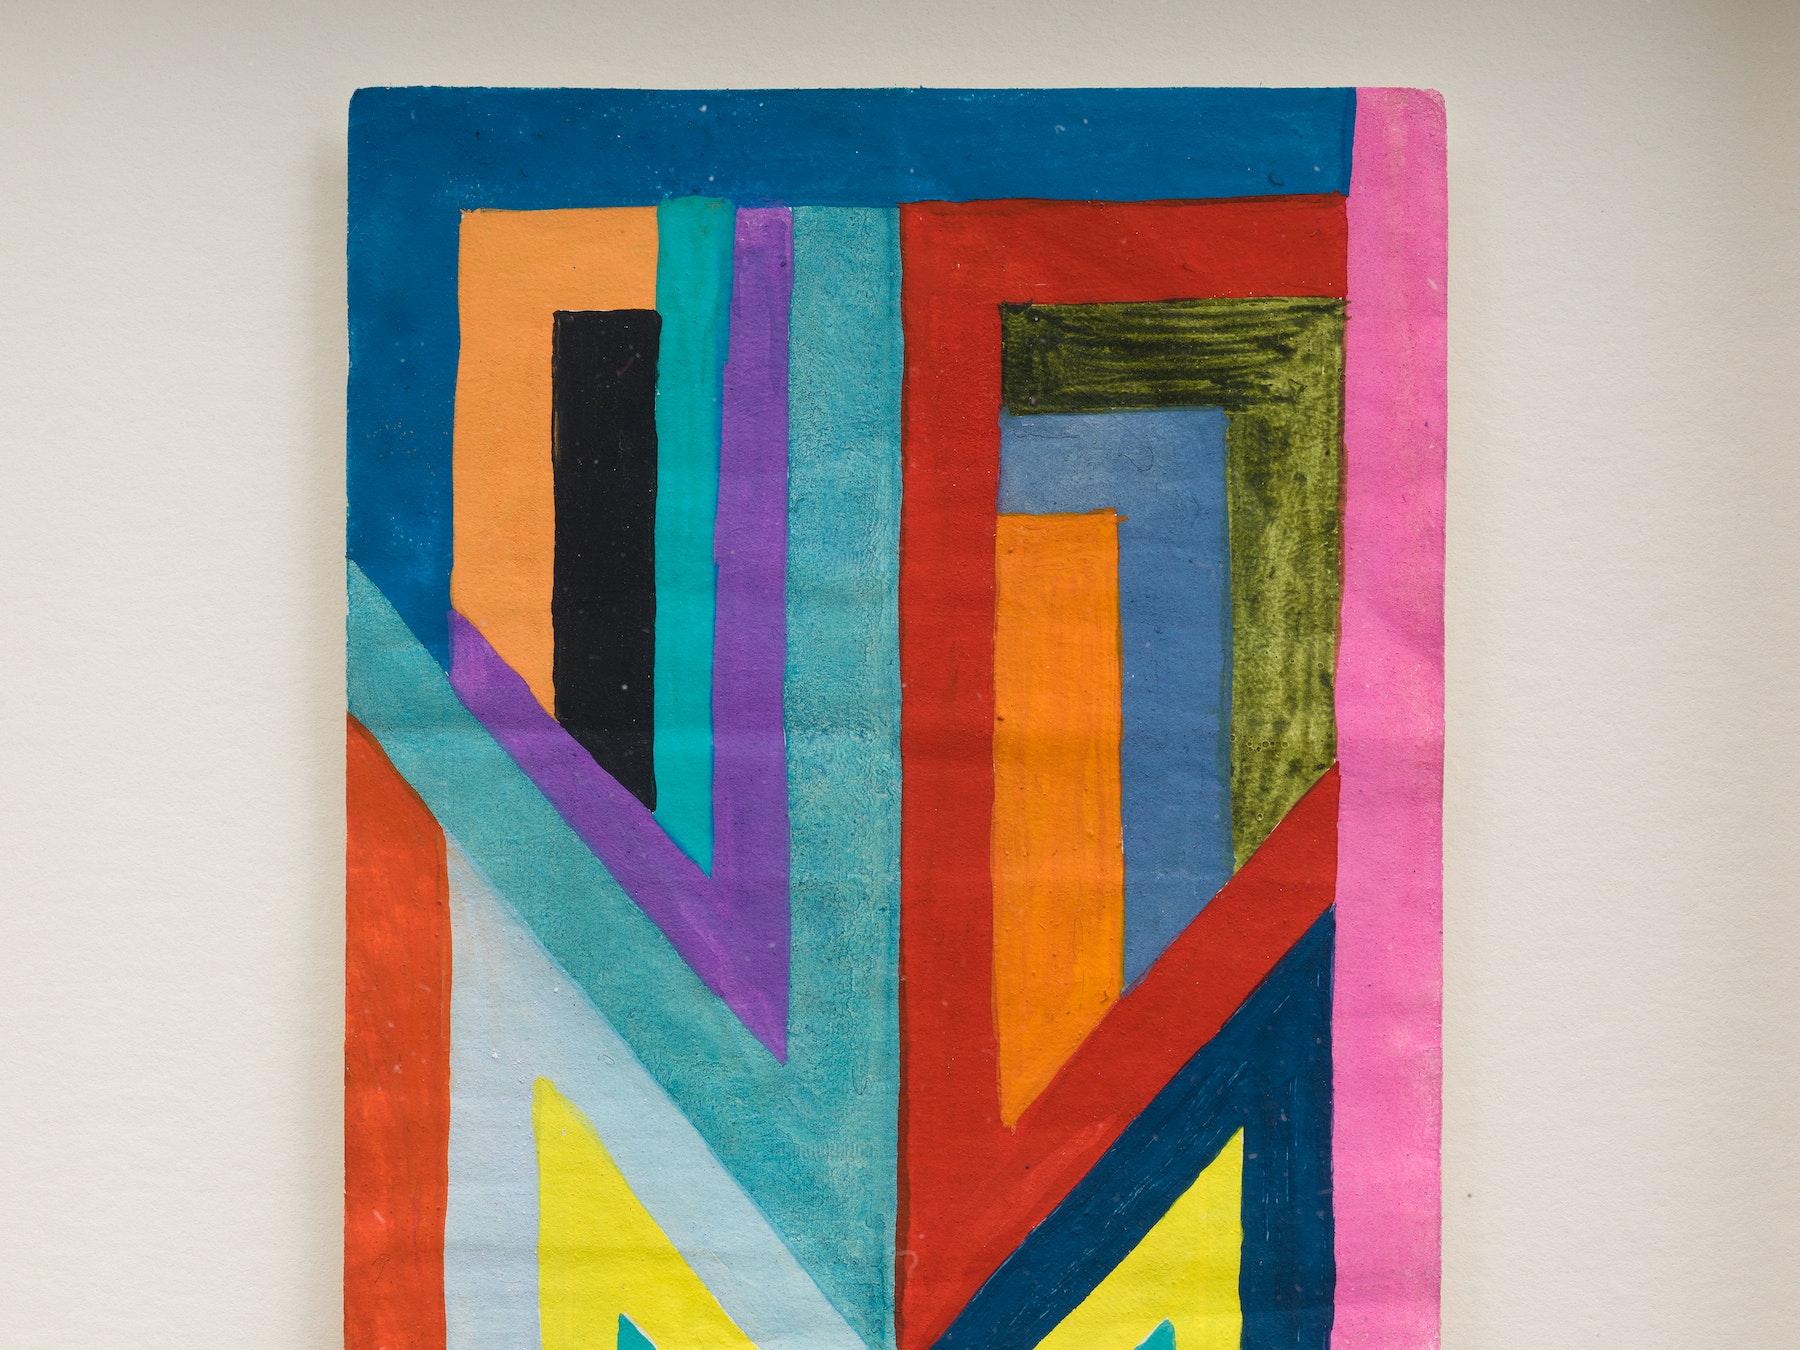 "Sarah Cain ""$ talisman,"" 2021 Acrylic on dollar bill 9 ¹⁄₂"" x 6 ¹⁄₄"" x 1 ³⁄₄"" [HxWxD] (24.13 x 15.85 x 4.45 cm) Inventory #CAS156 Courtesy of the artist and Vielmetter Los Angeles Photo credit: Jeff McLane"